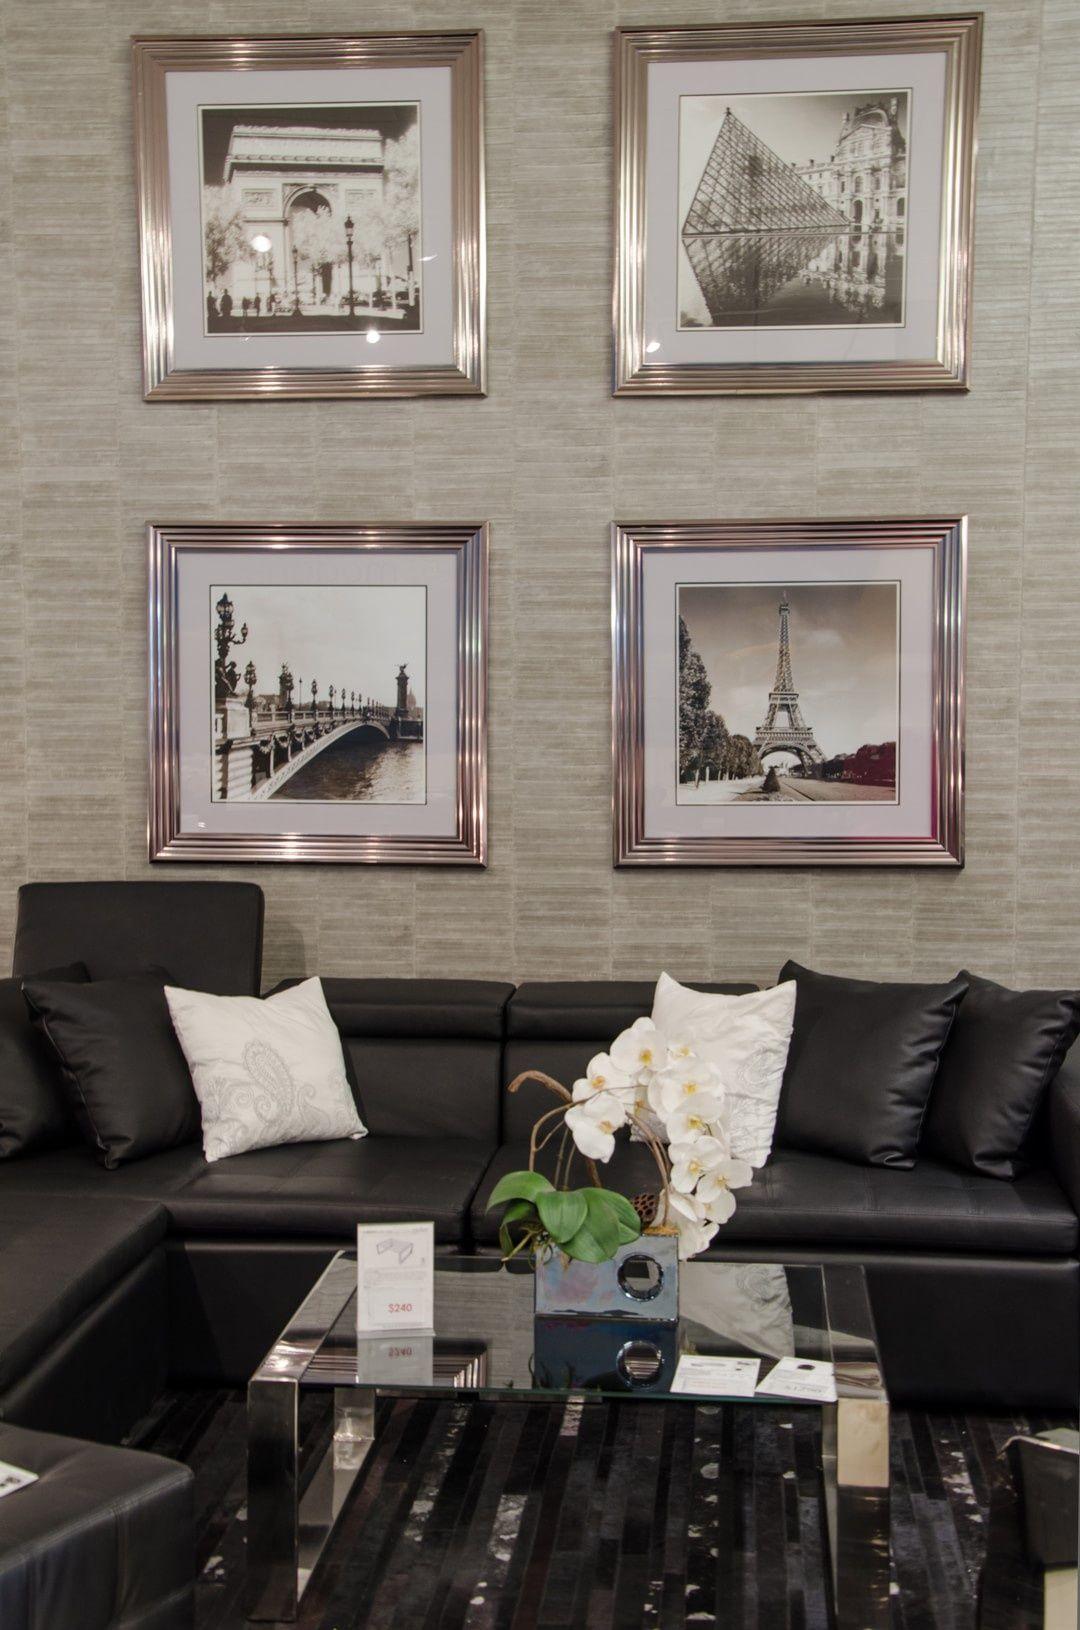 Awe Inspiring Bergamo Sectional Leather Modern Sofa Black With Artwork Evergreenethics Interior Chair Design Evergreenethicsorg